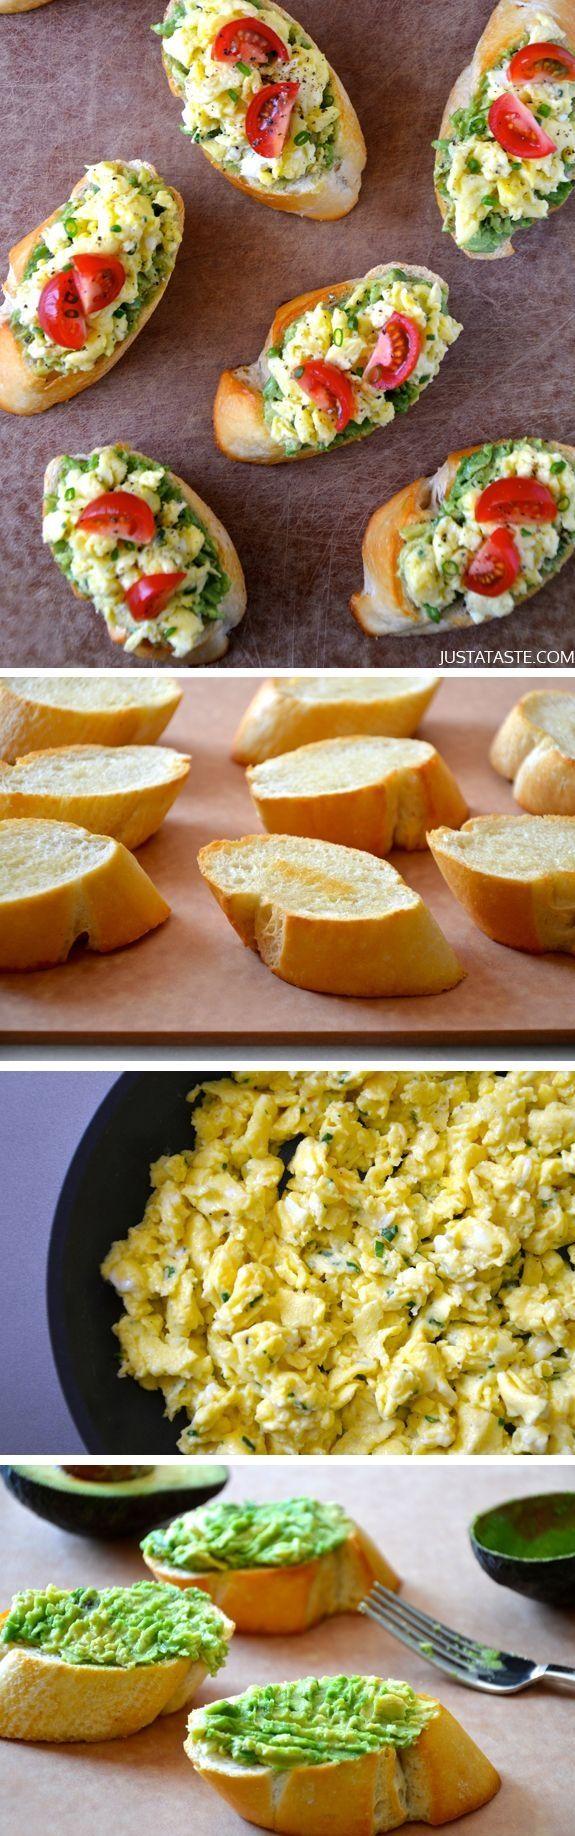 Quick and Easy Breakfast Bruschetta